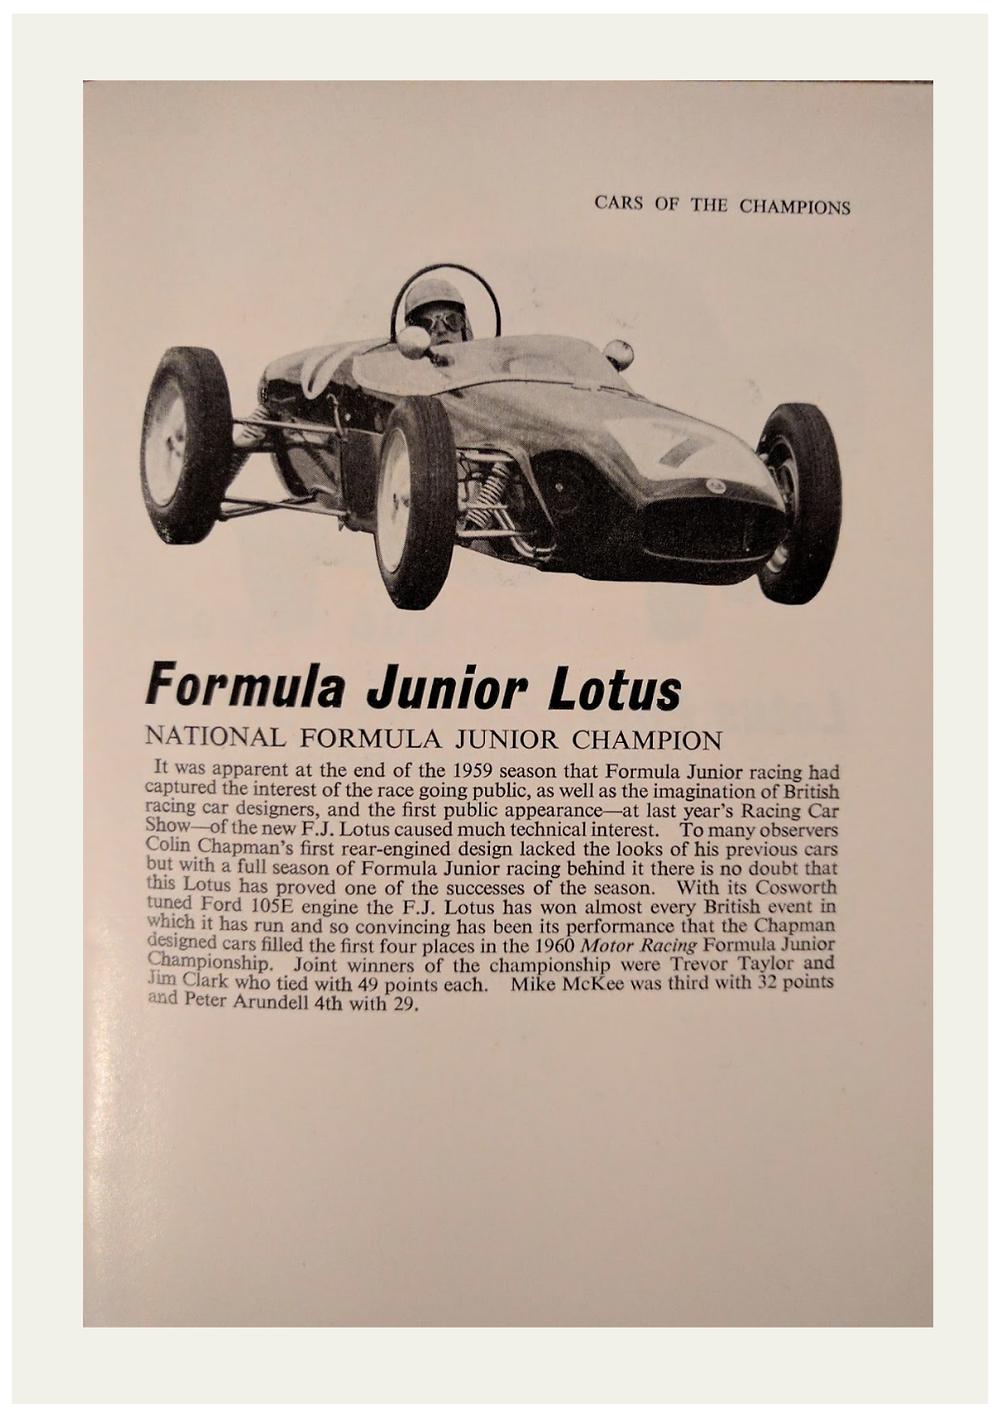 Lotus Formula Junior Car of The Champions